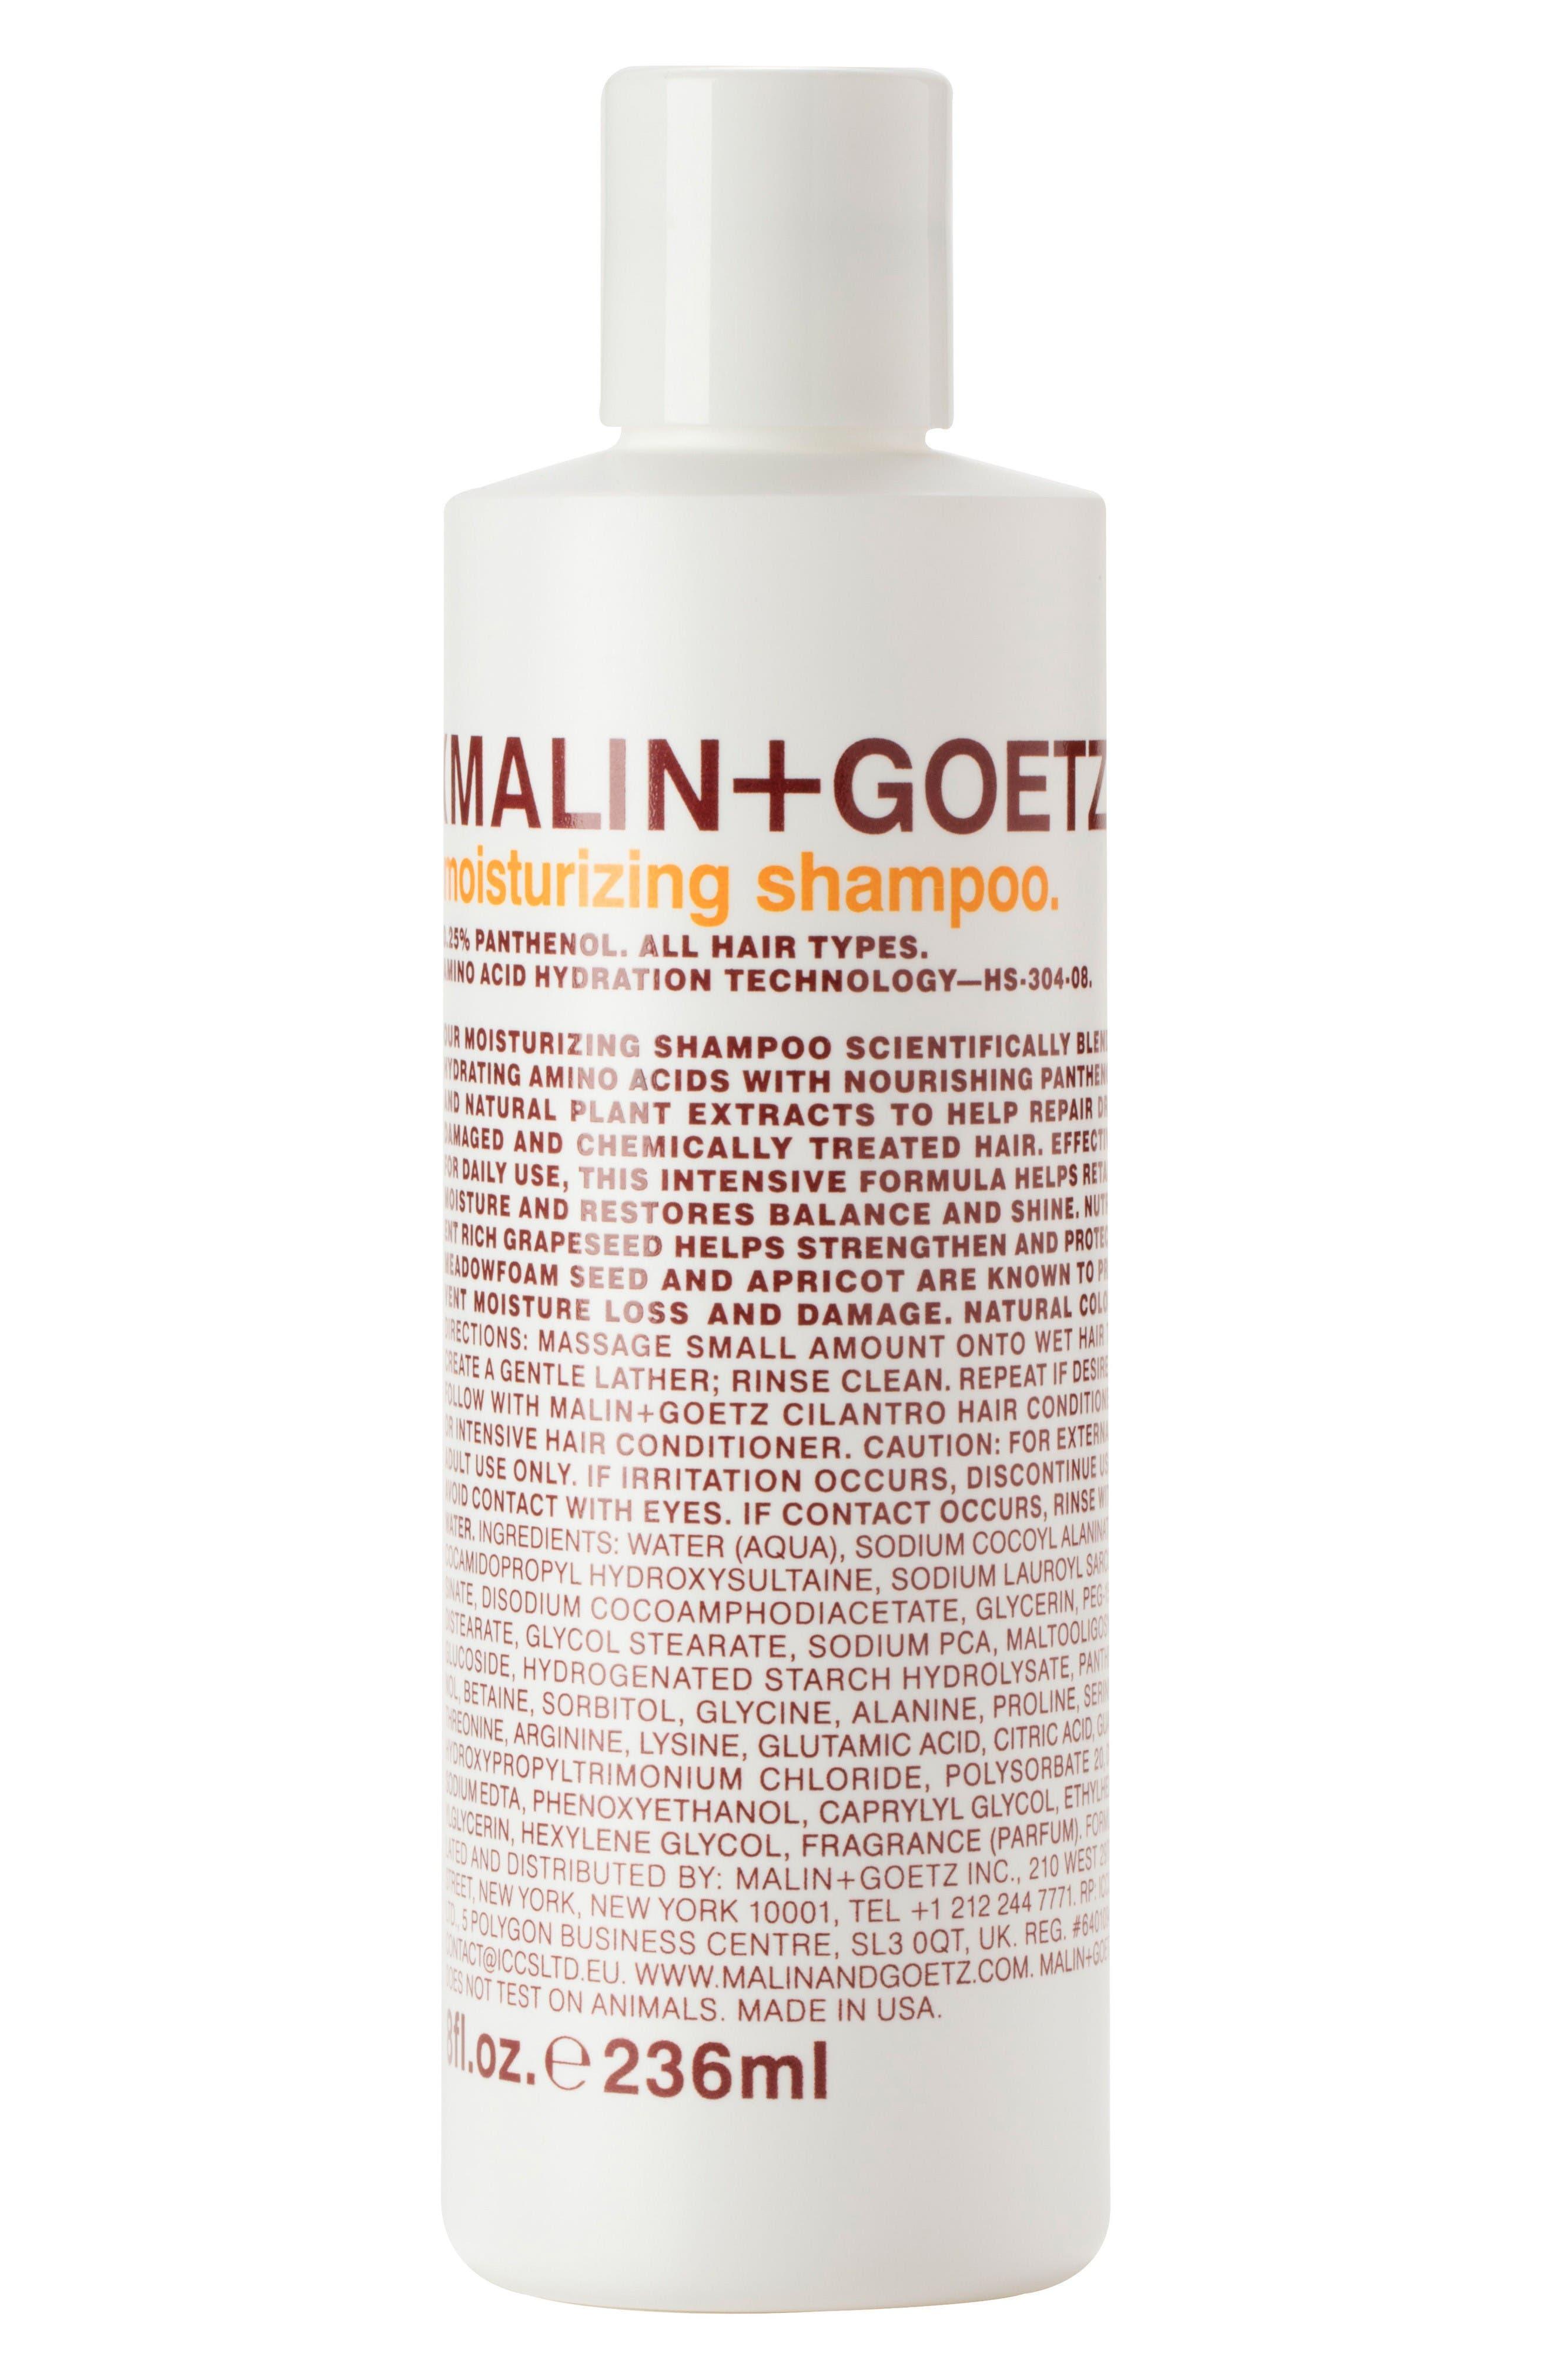 Main Image - MALIN+GOETZ Moisturizing Shampoo